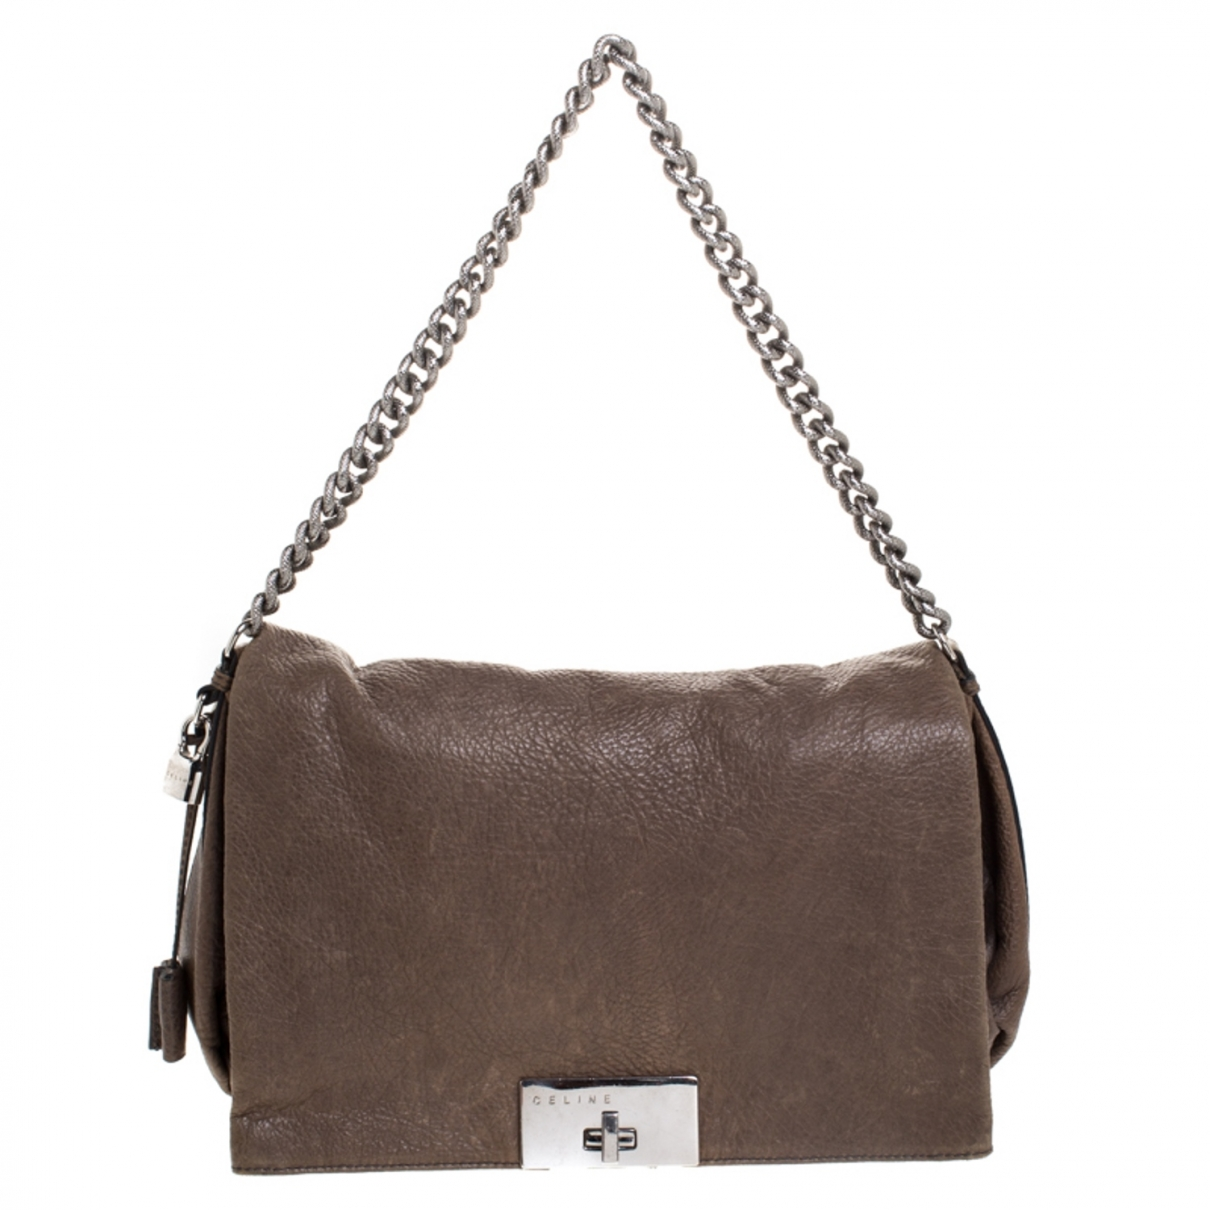 Celine \N Beige Leather handbag for Women \N